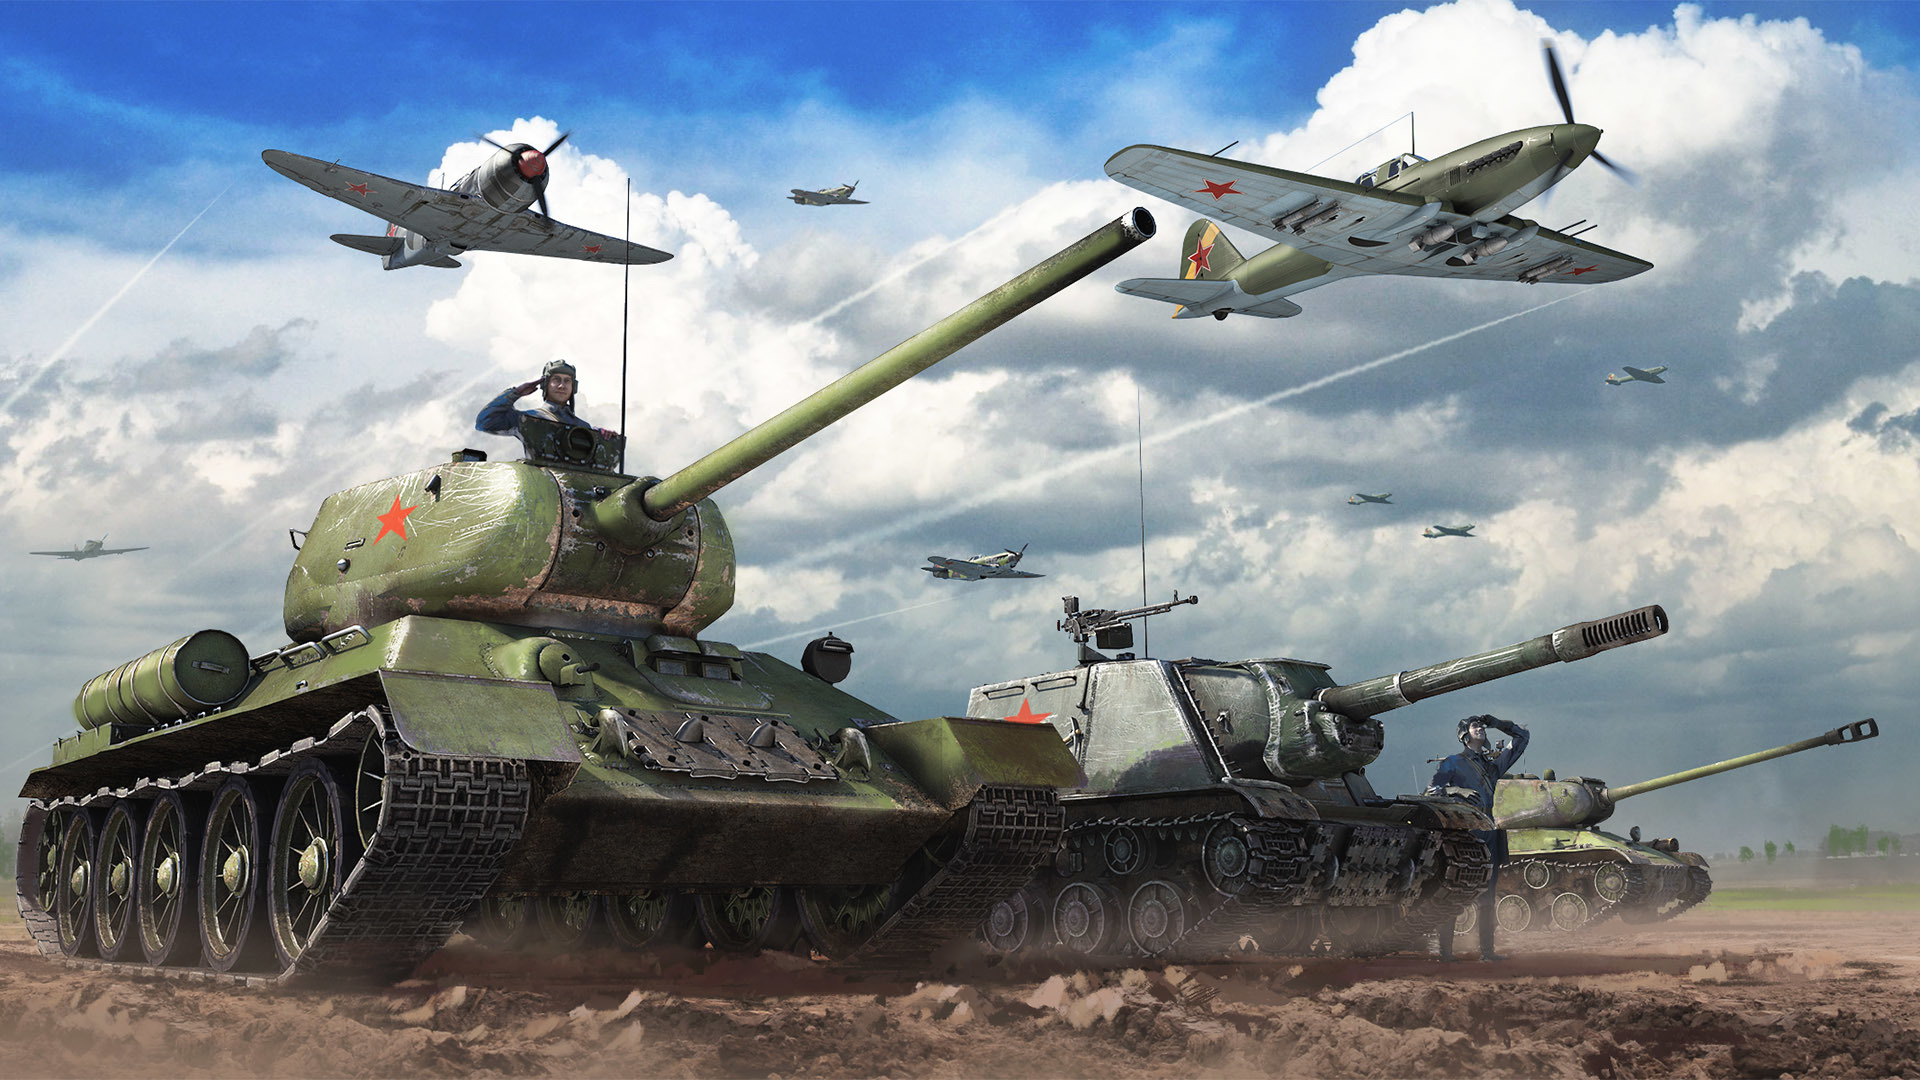 War thunder ground forces wallpaper hd